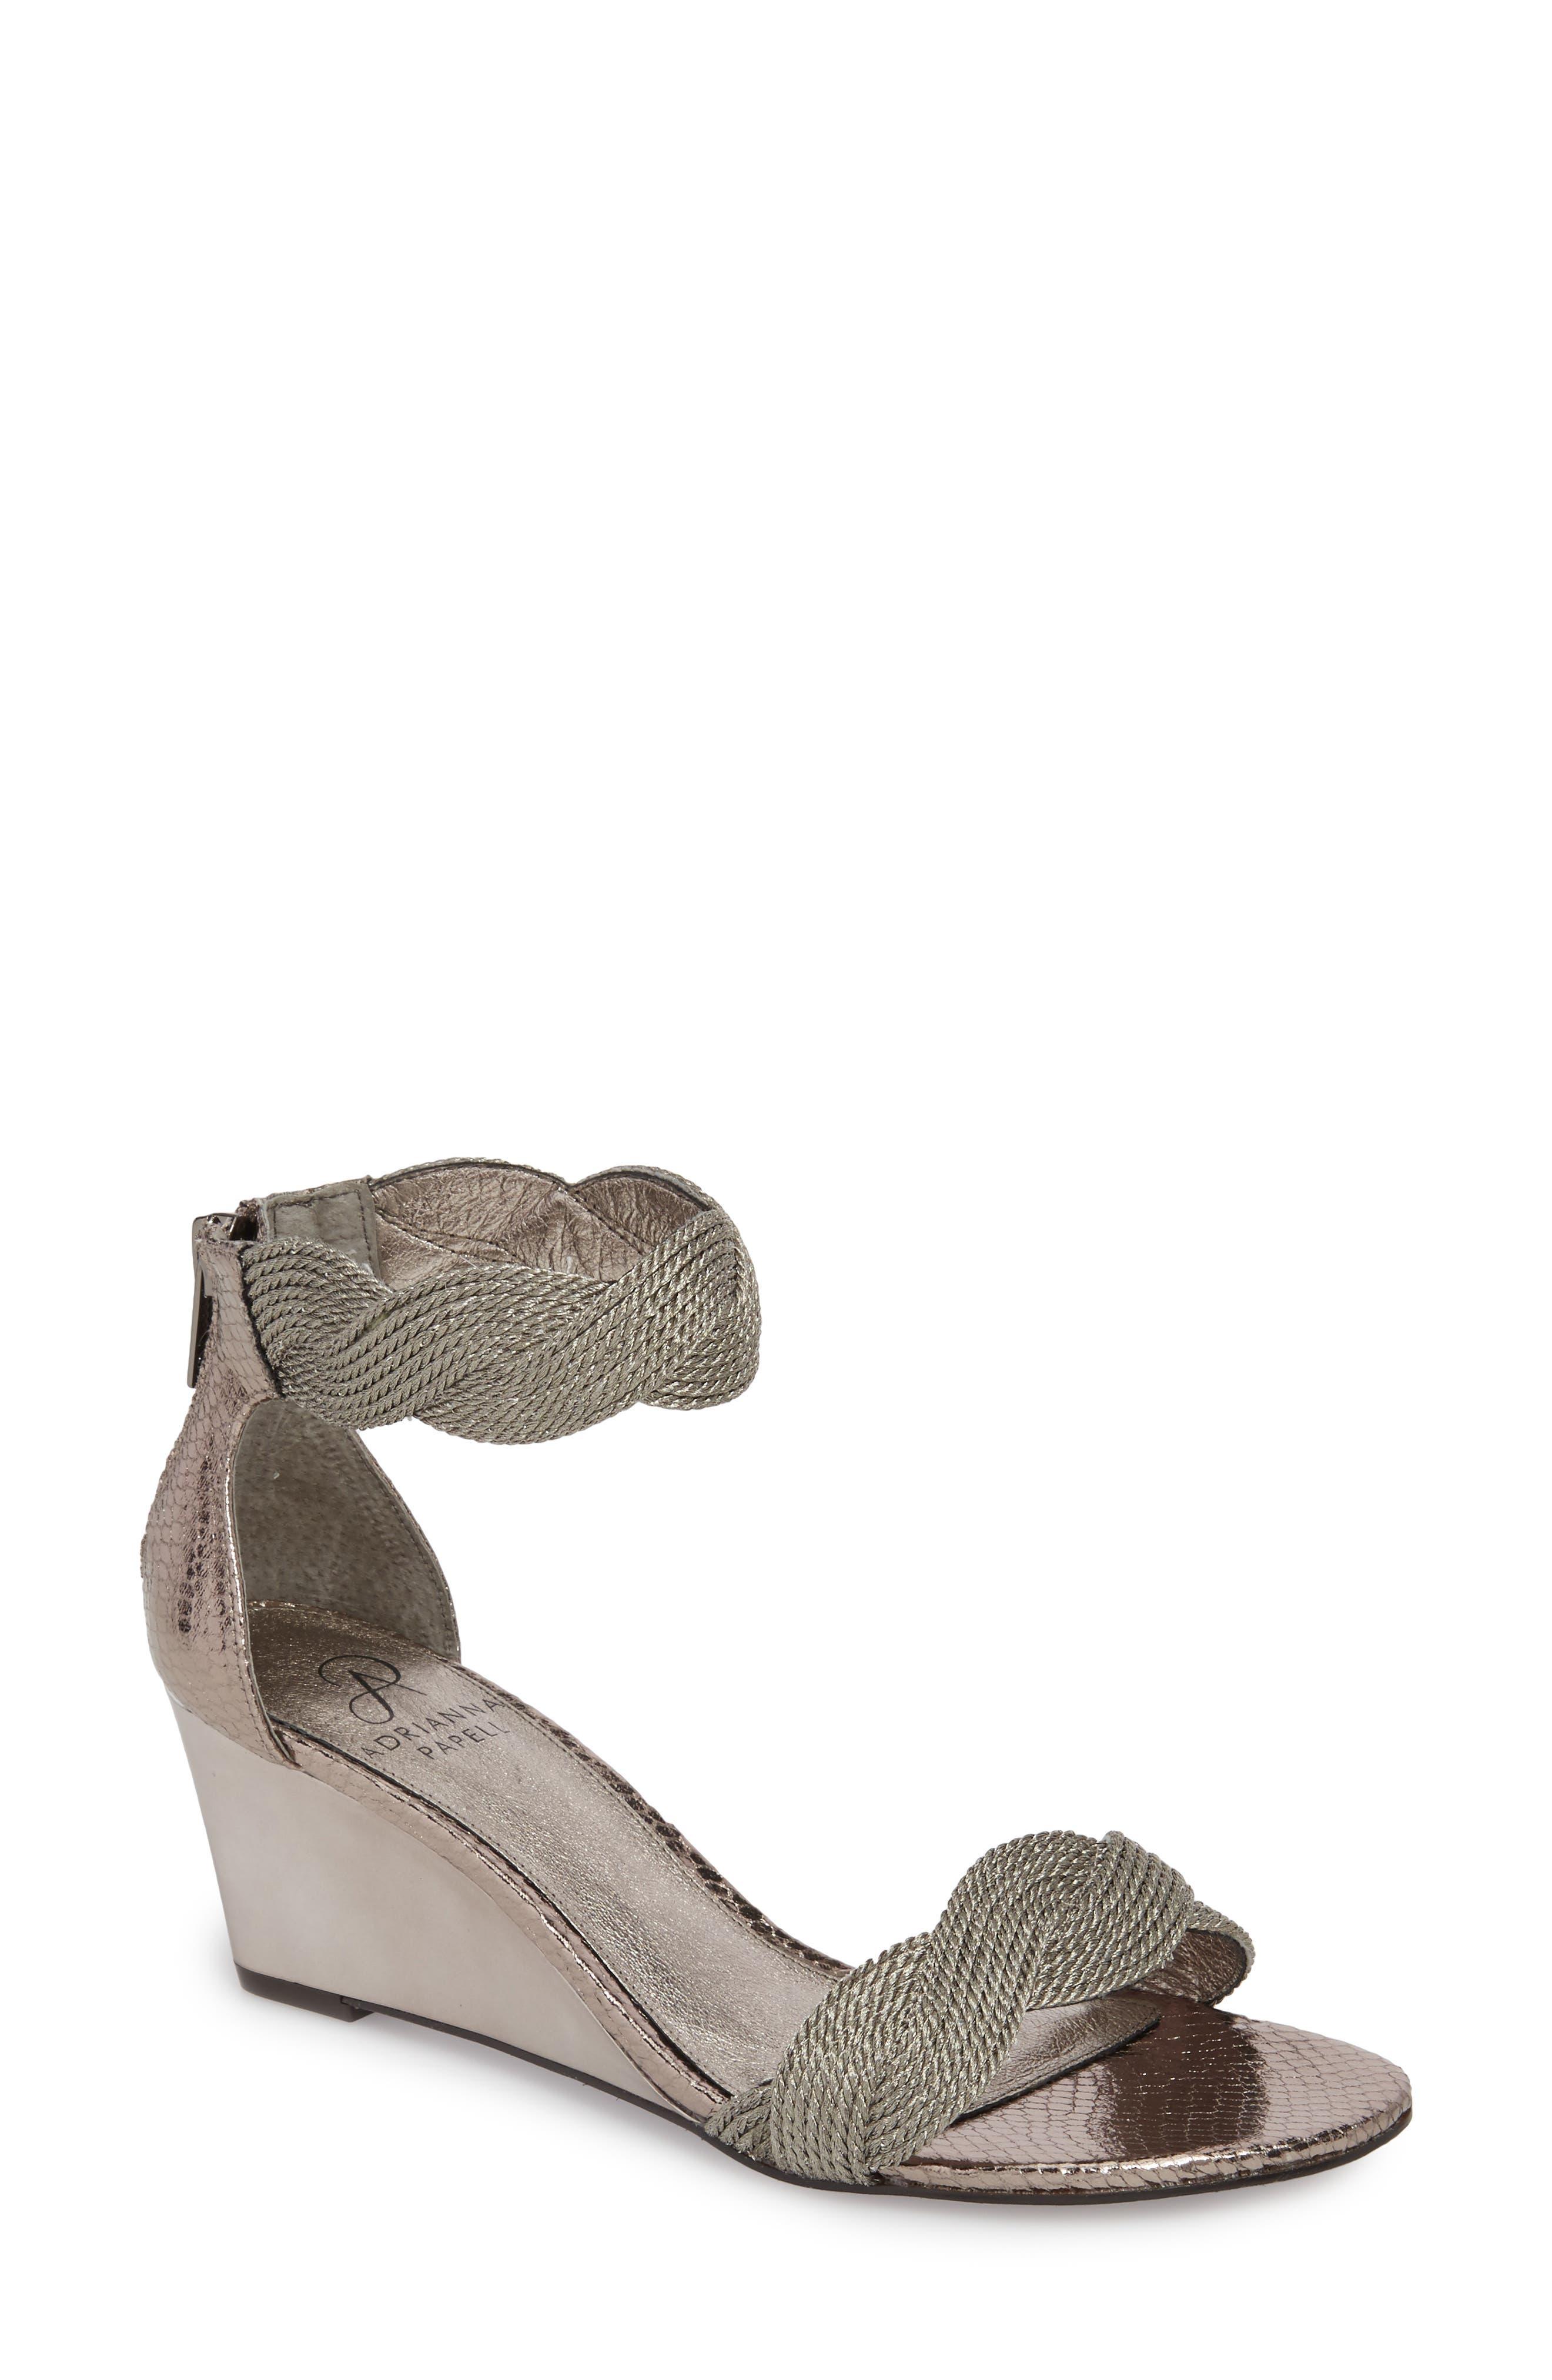 Adore Ankle Strap Sandal,                             Main thumbnail 1, color,                             GUNMETAL FABRIC